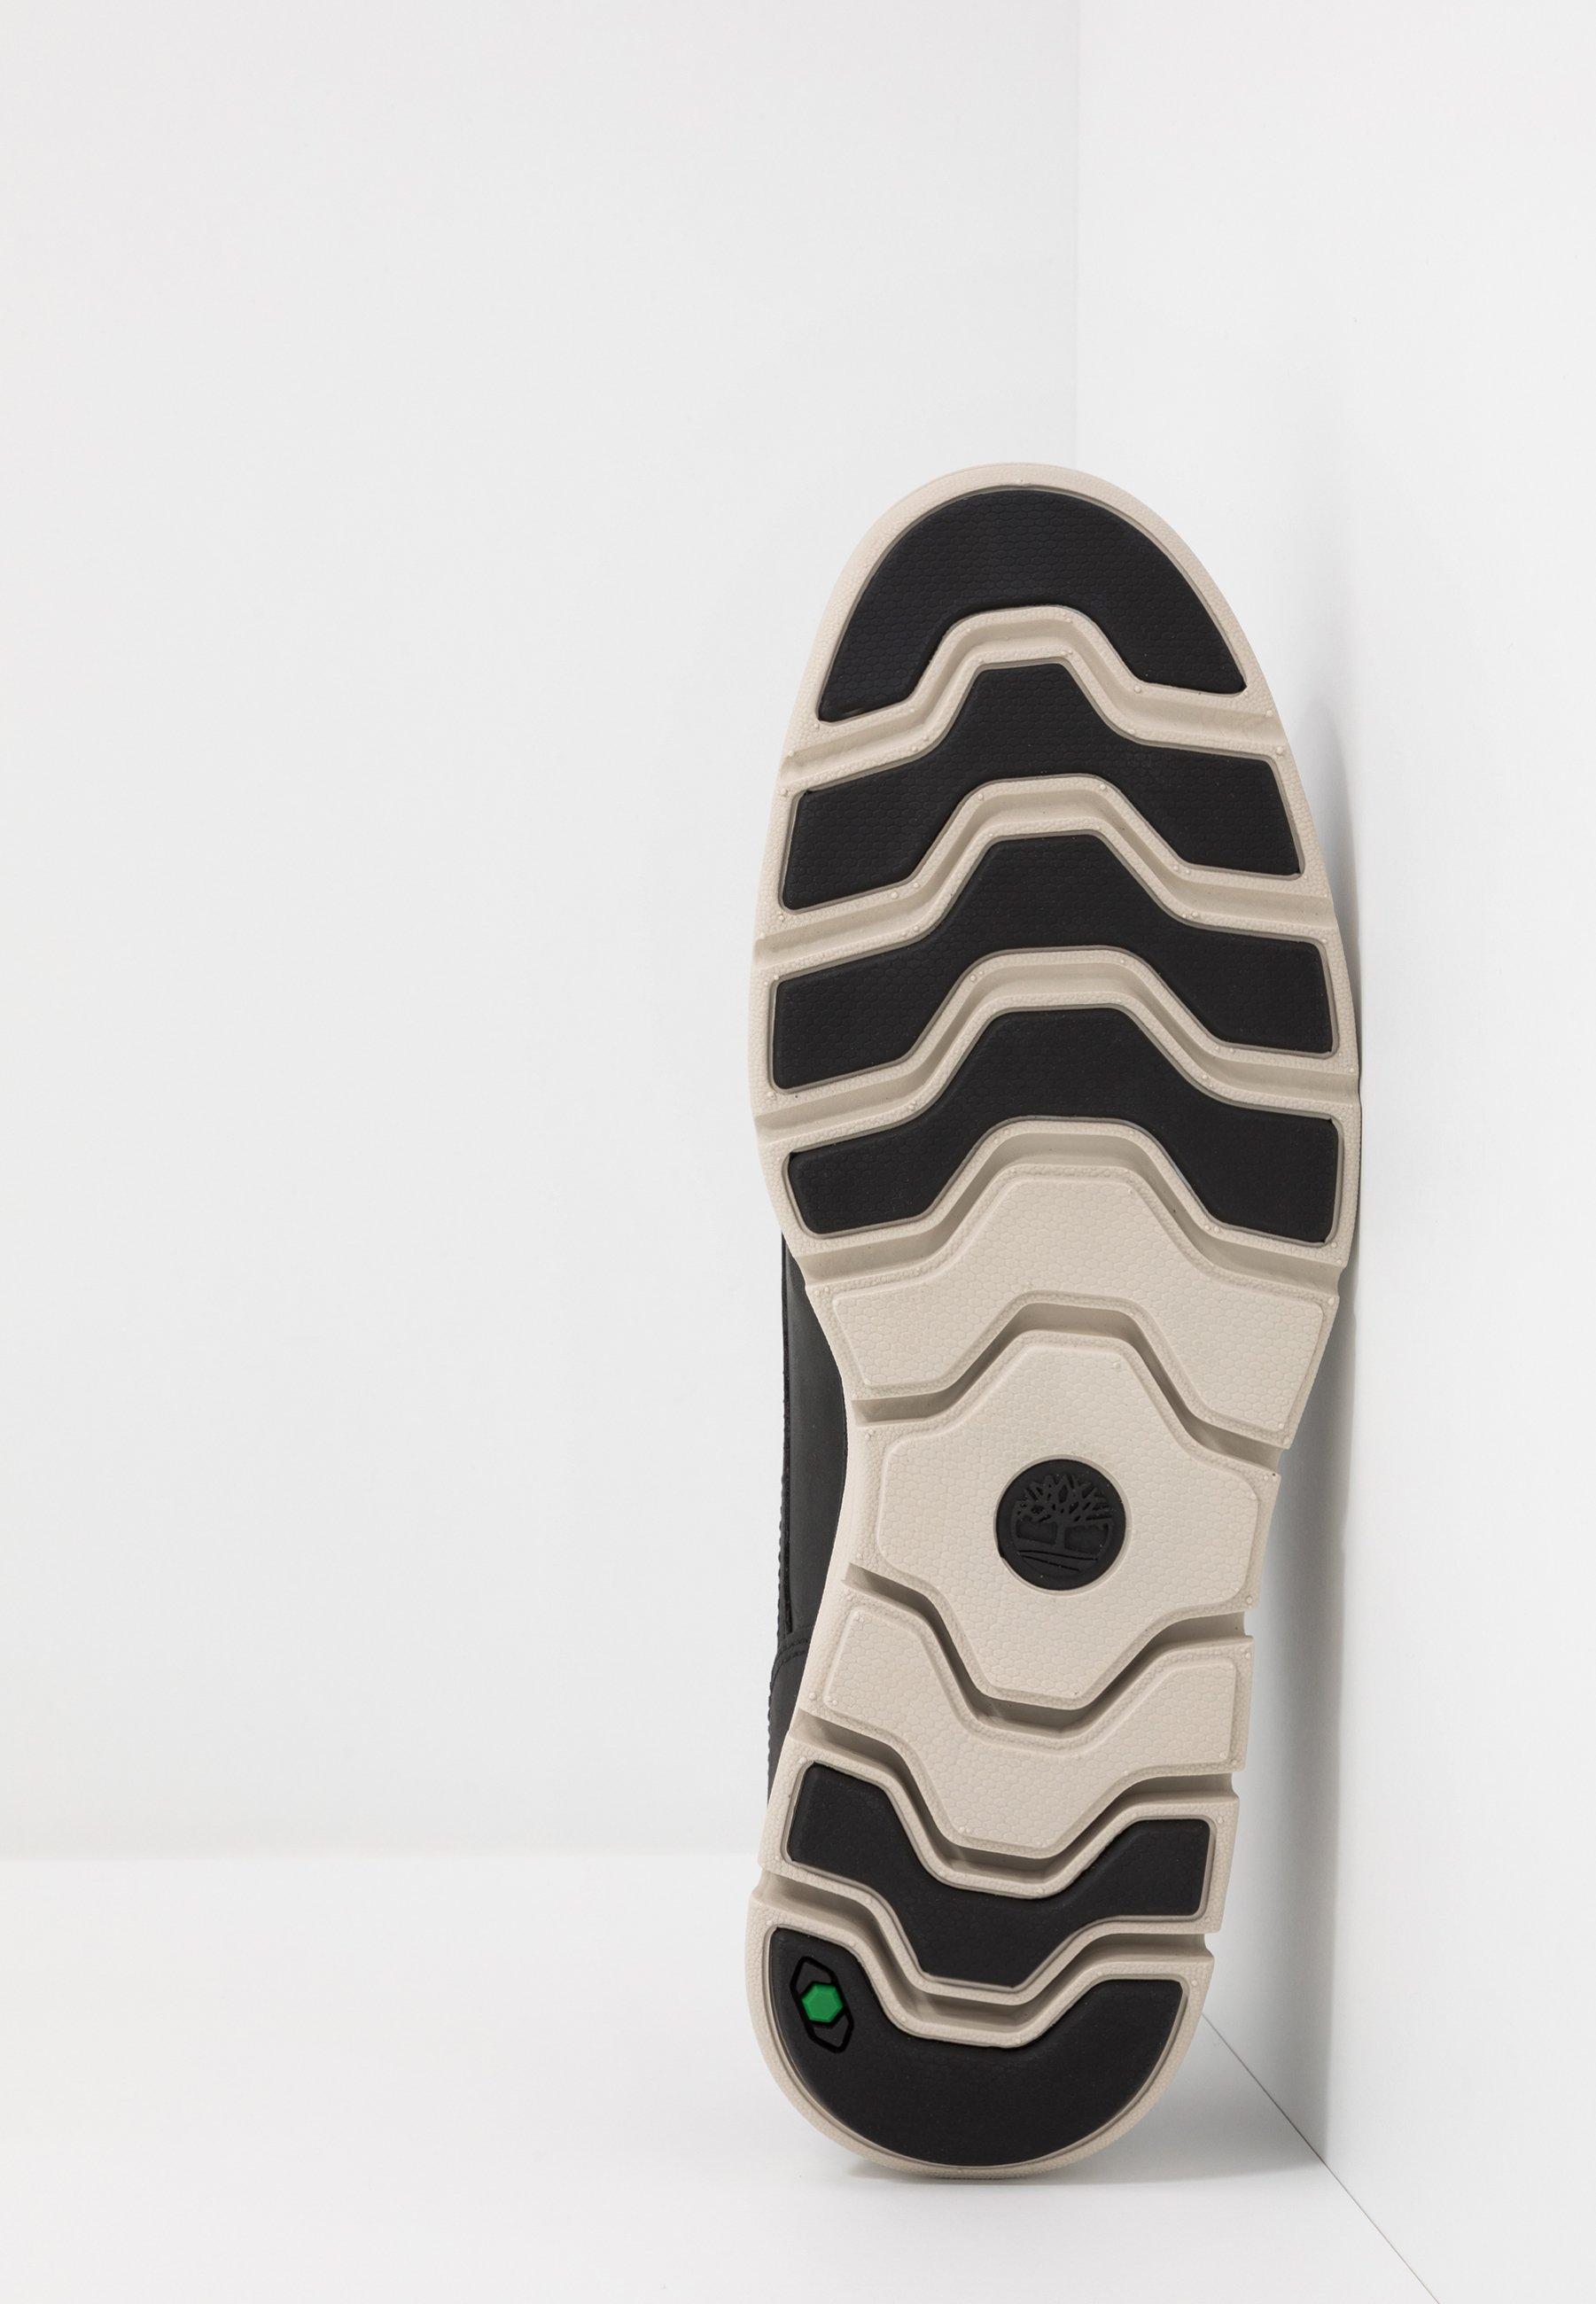 Homme BRADSTREET - Chaussures à lacets - dark grey